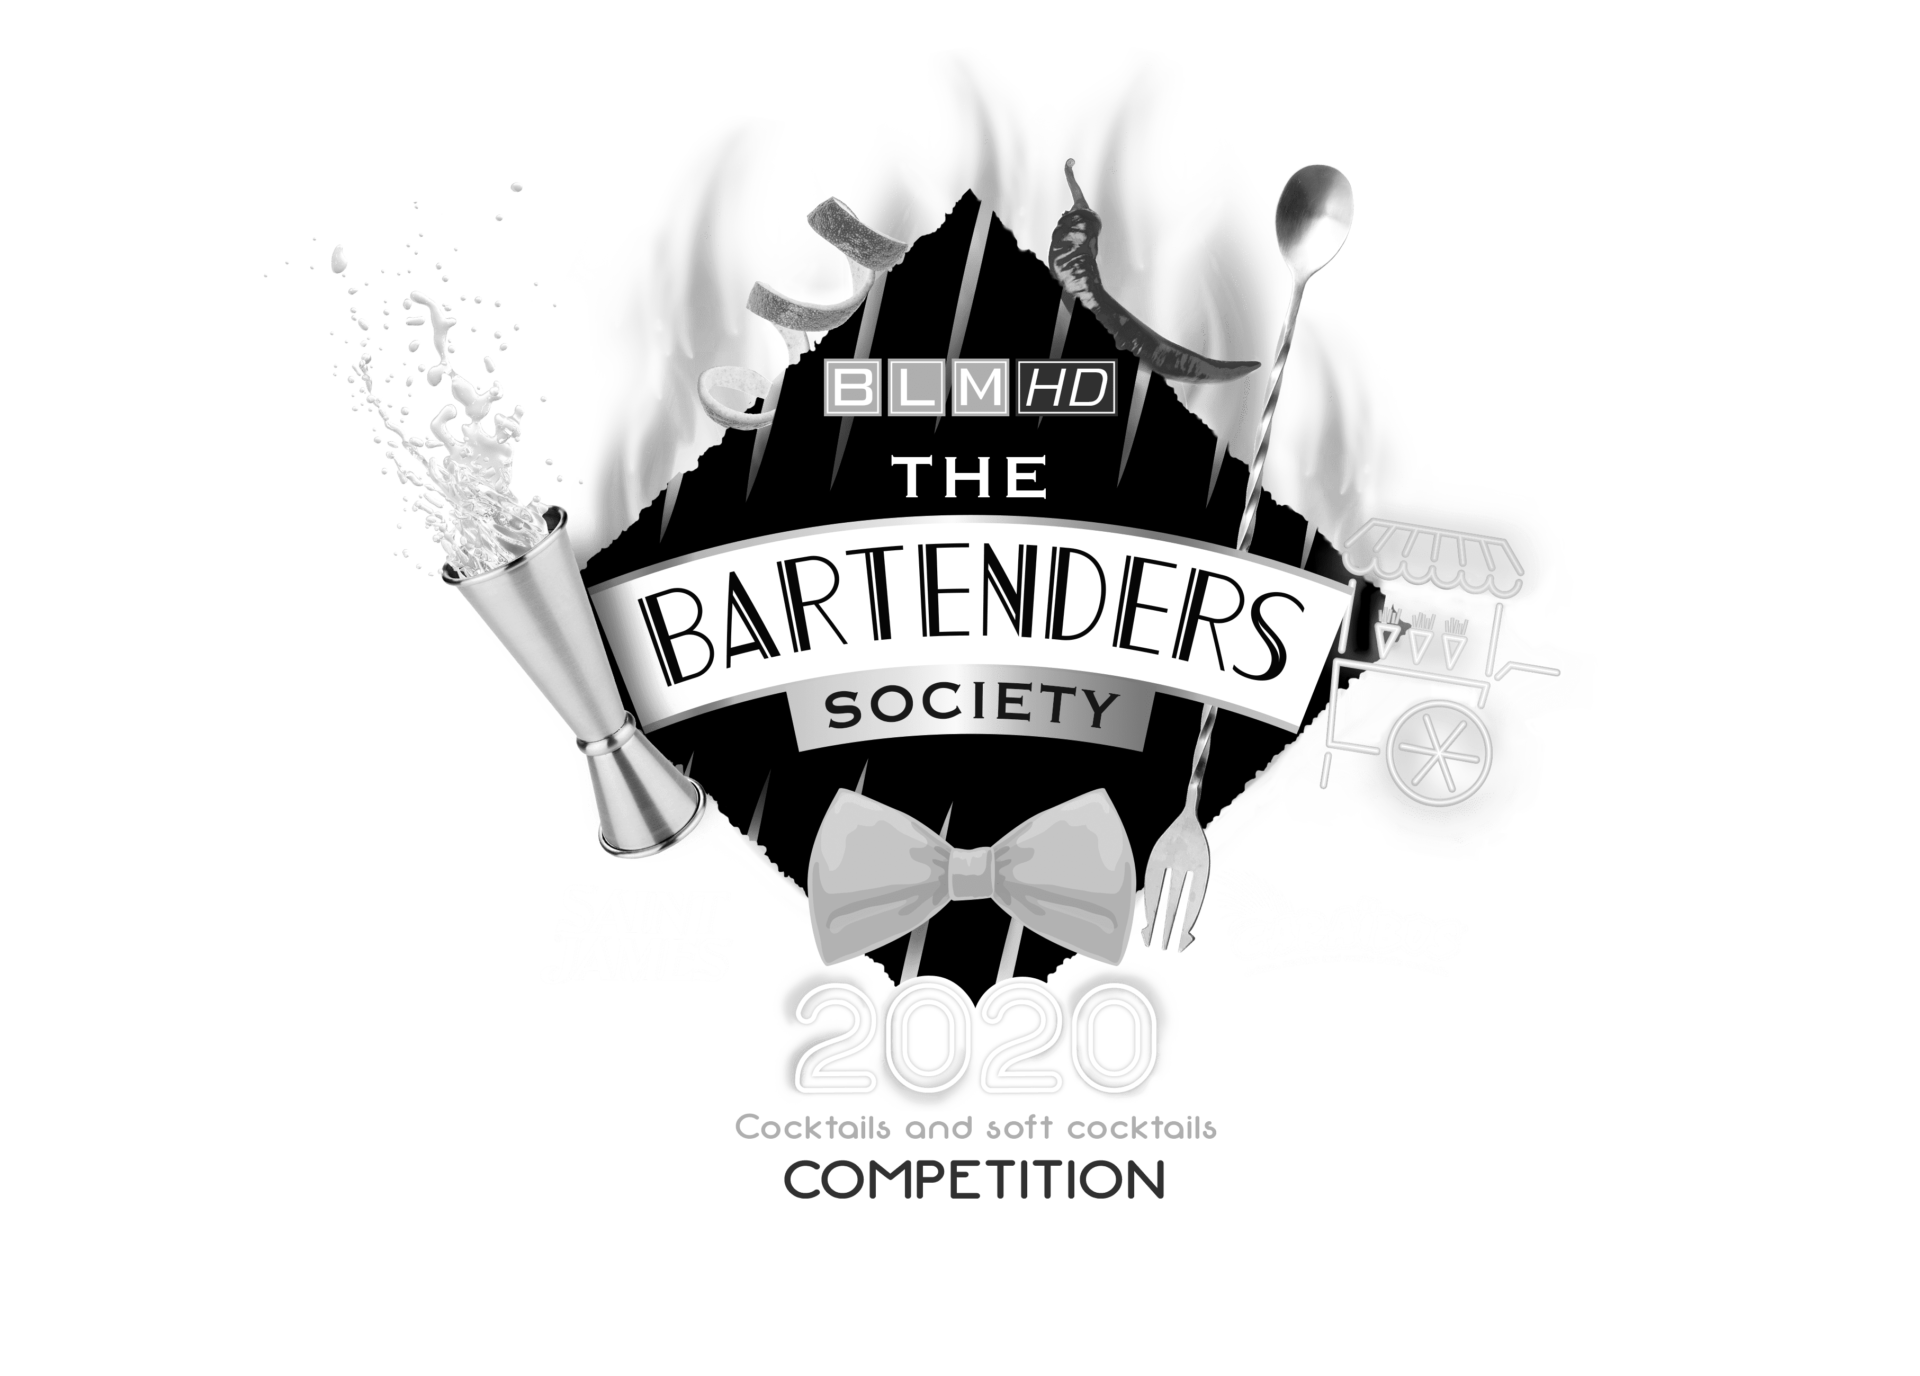 the bartenders society logo